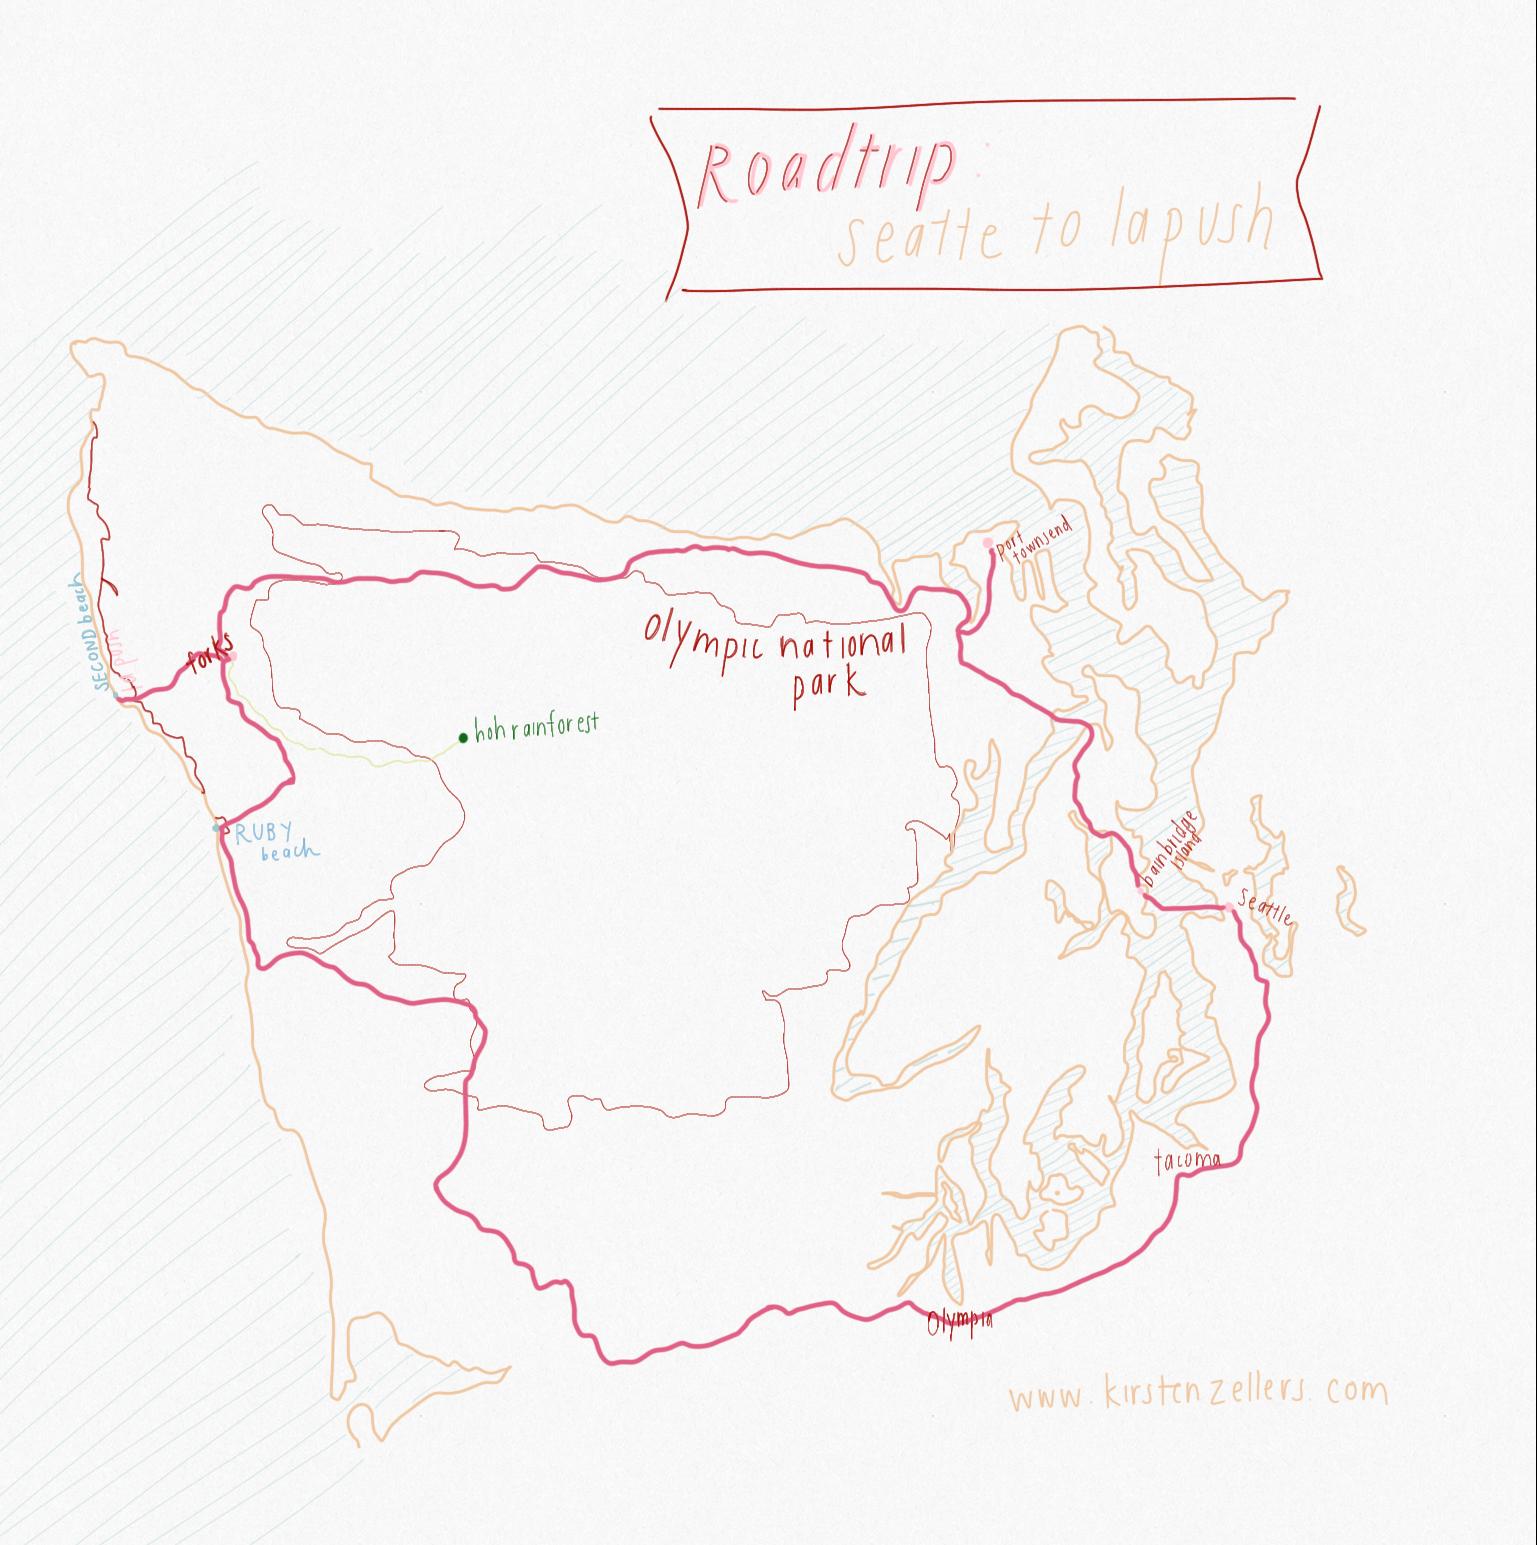 Roadtrip guide: Seattle to La Push WA